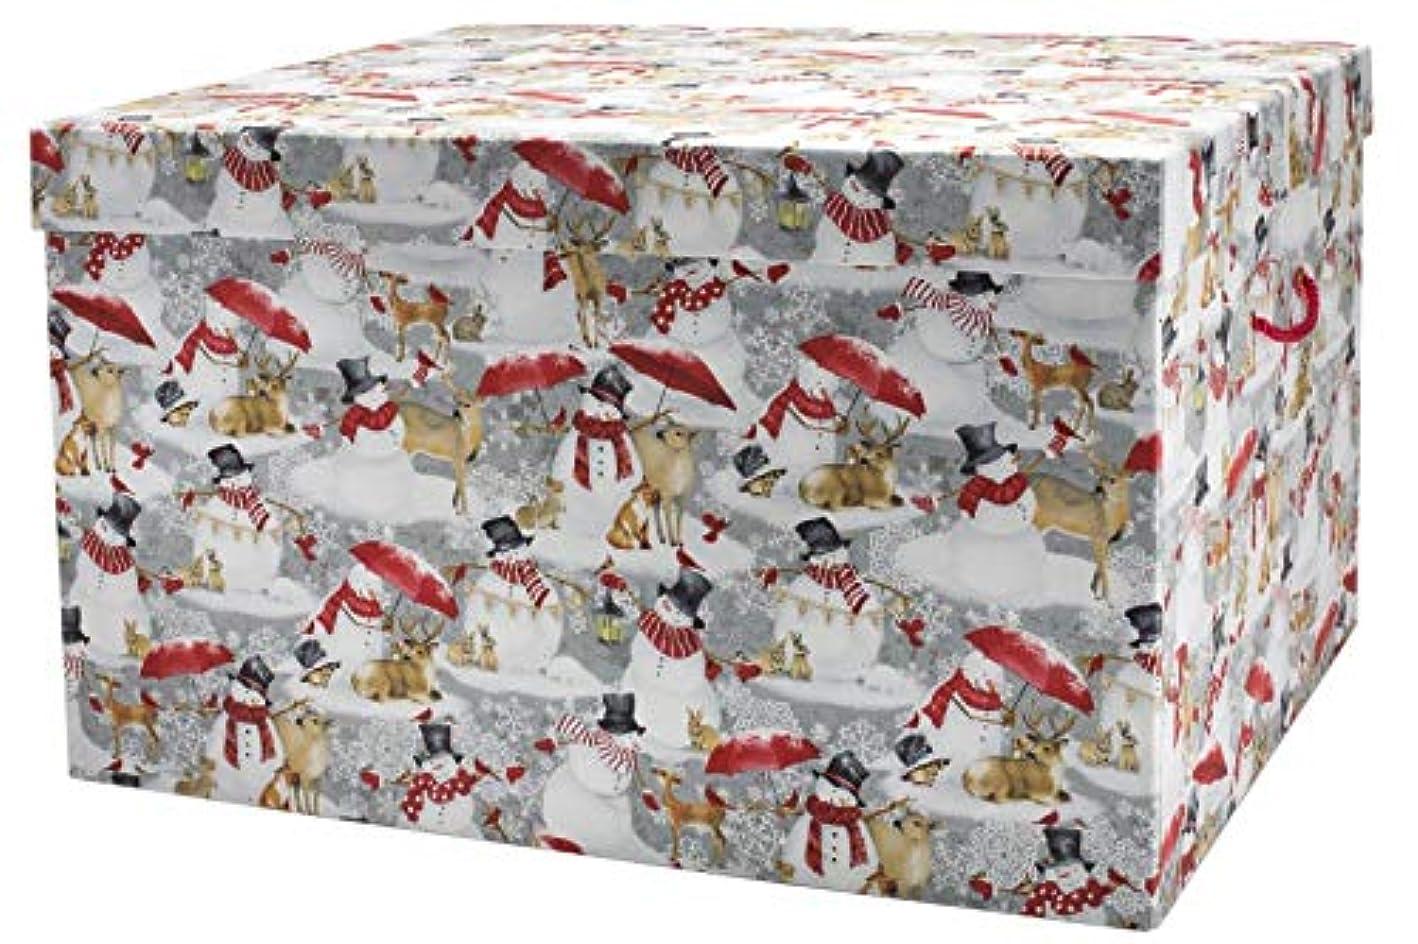 Ultimate Ornament Chest - Let It Snowman, Acid-Free Ornament Storage Box